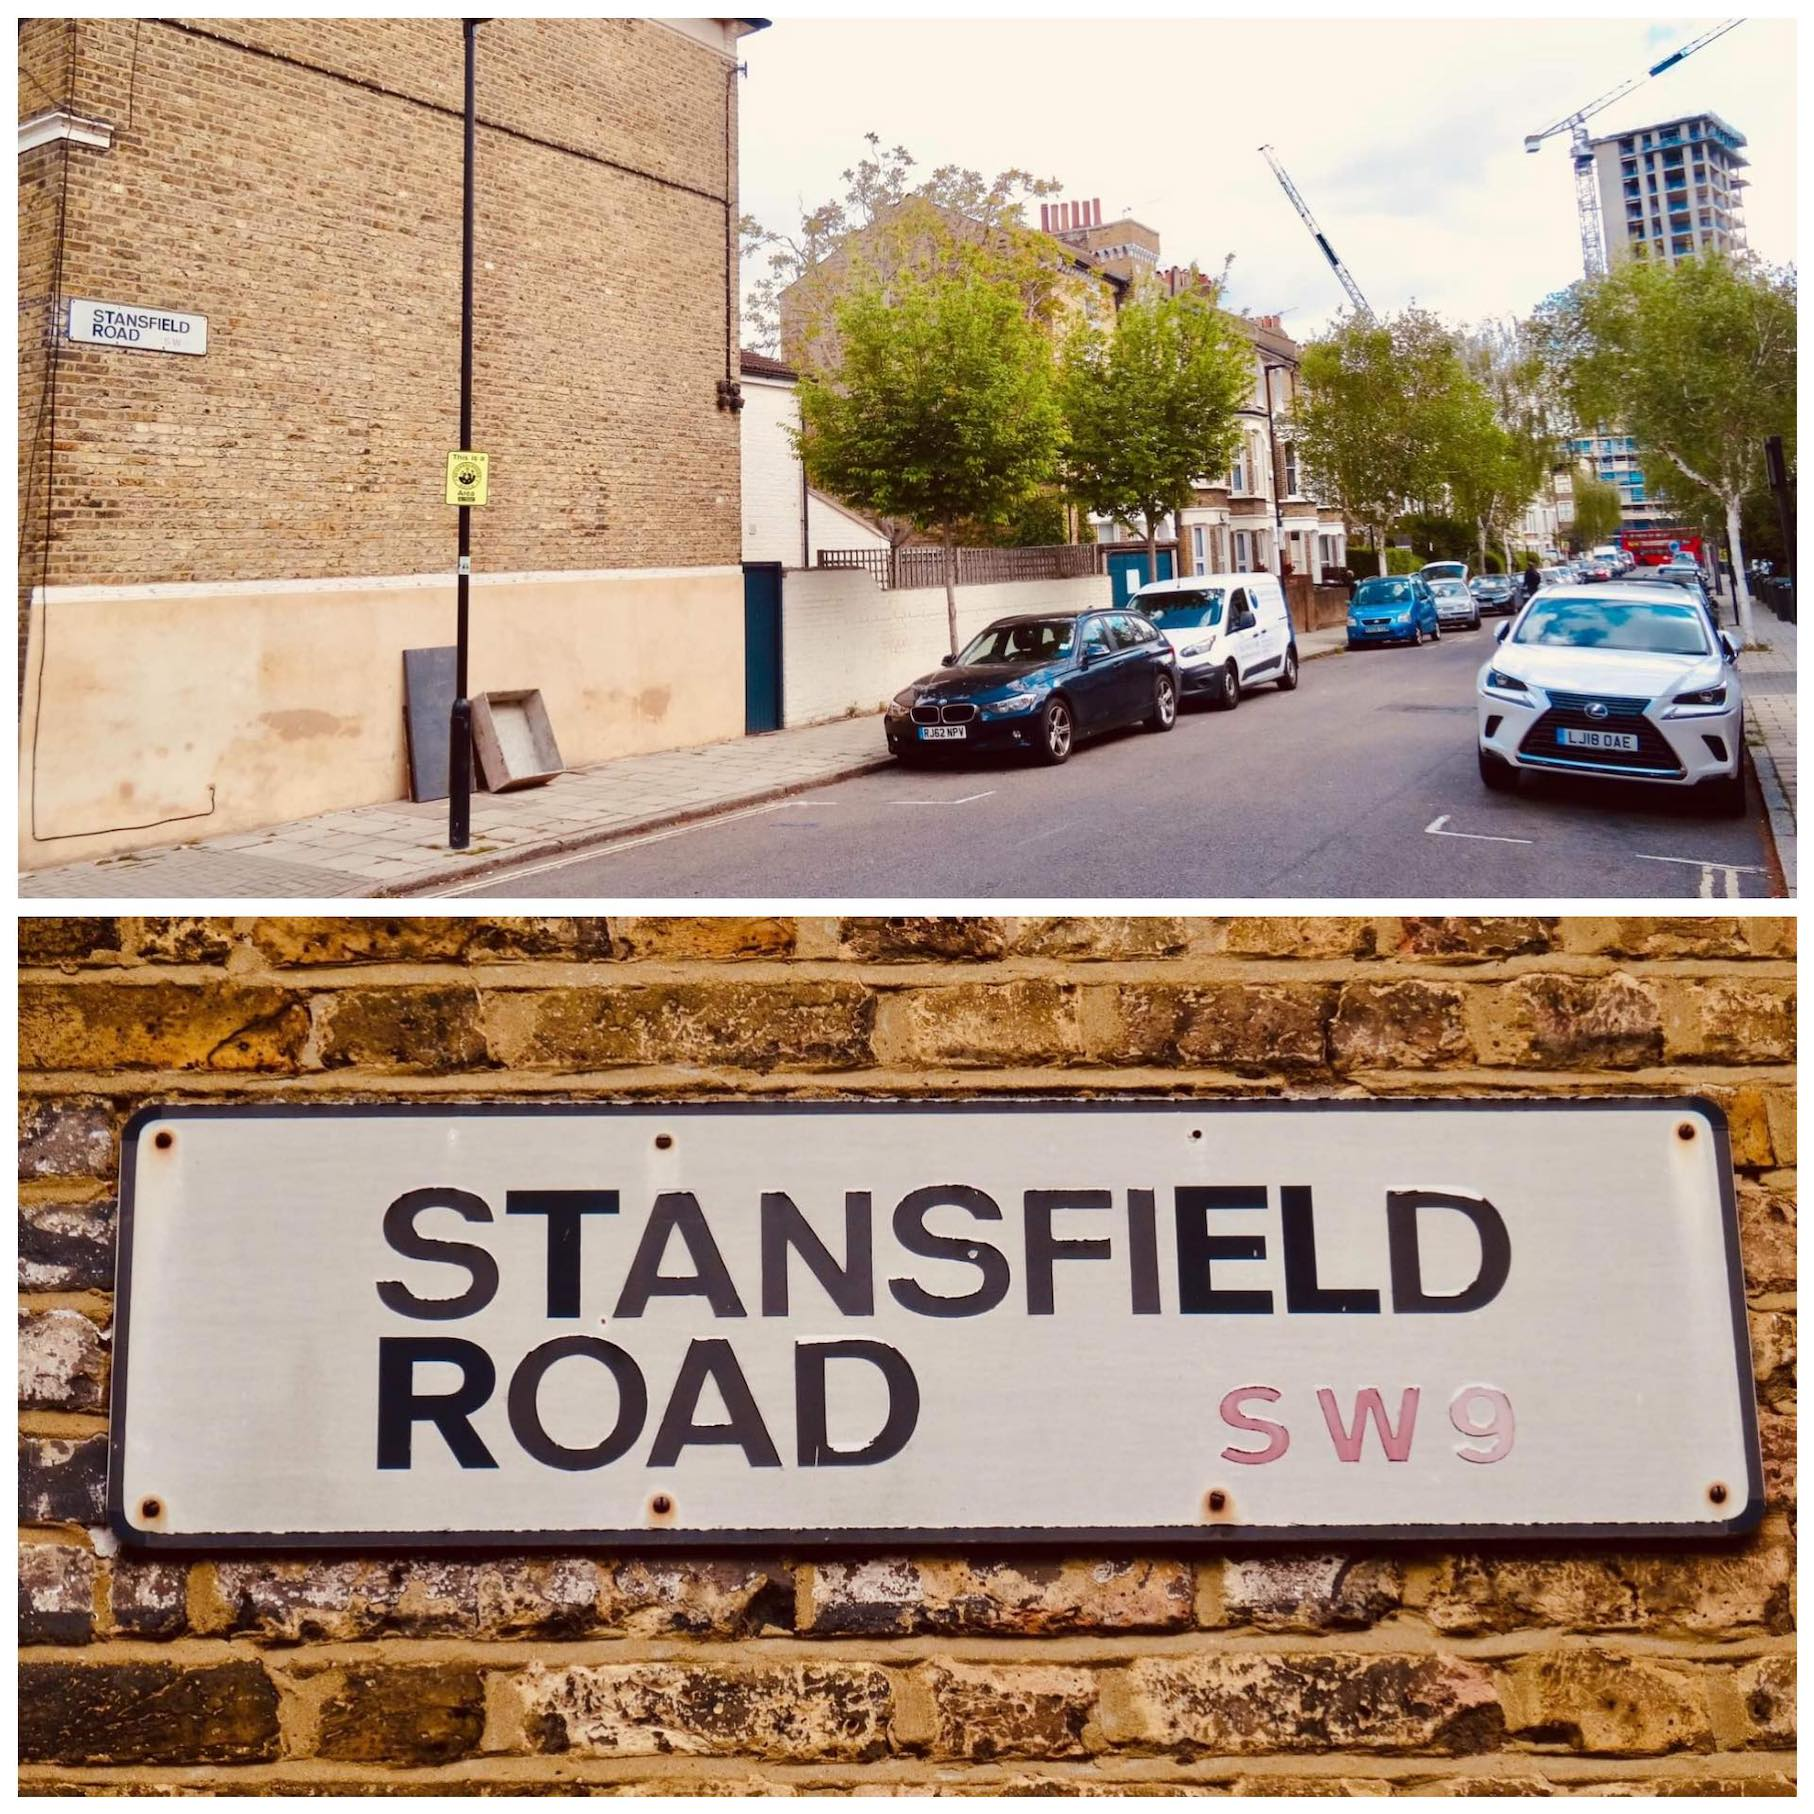 Stansfield Road in London